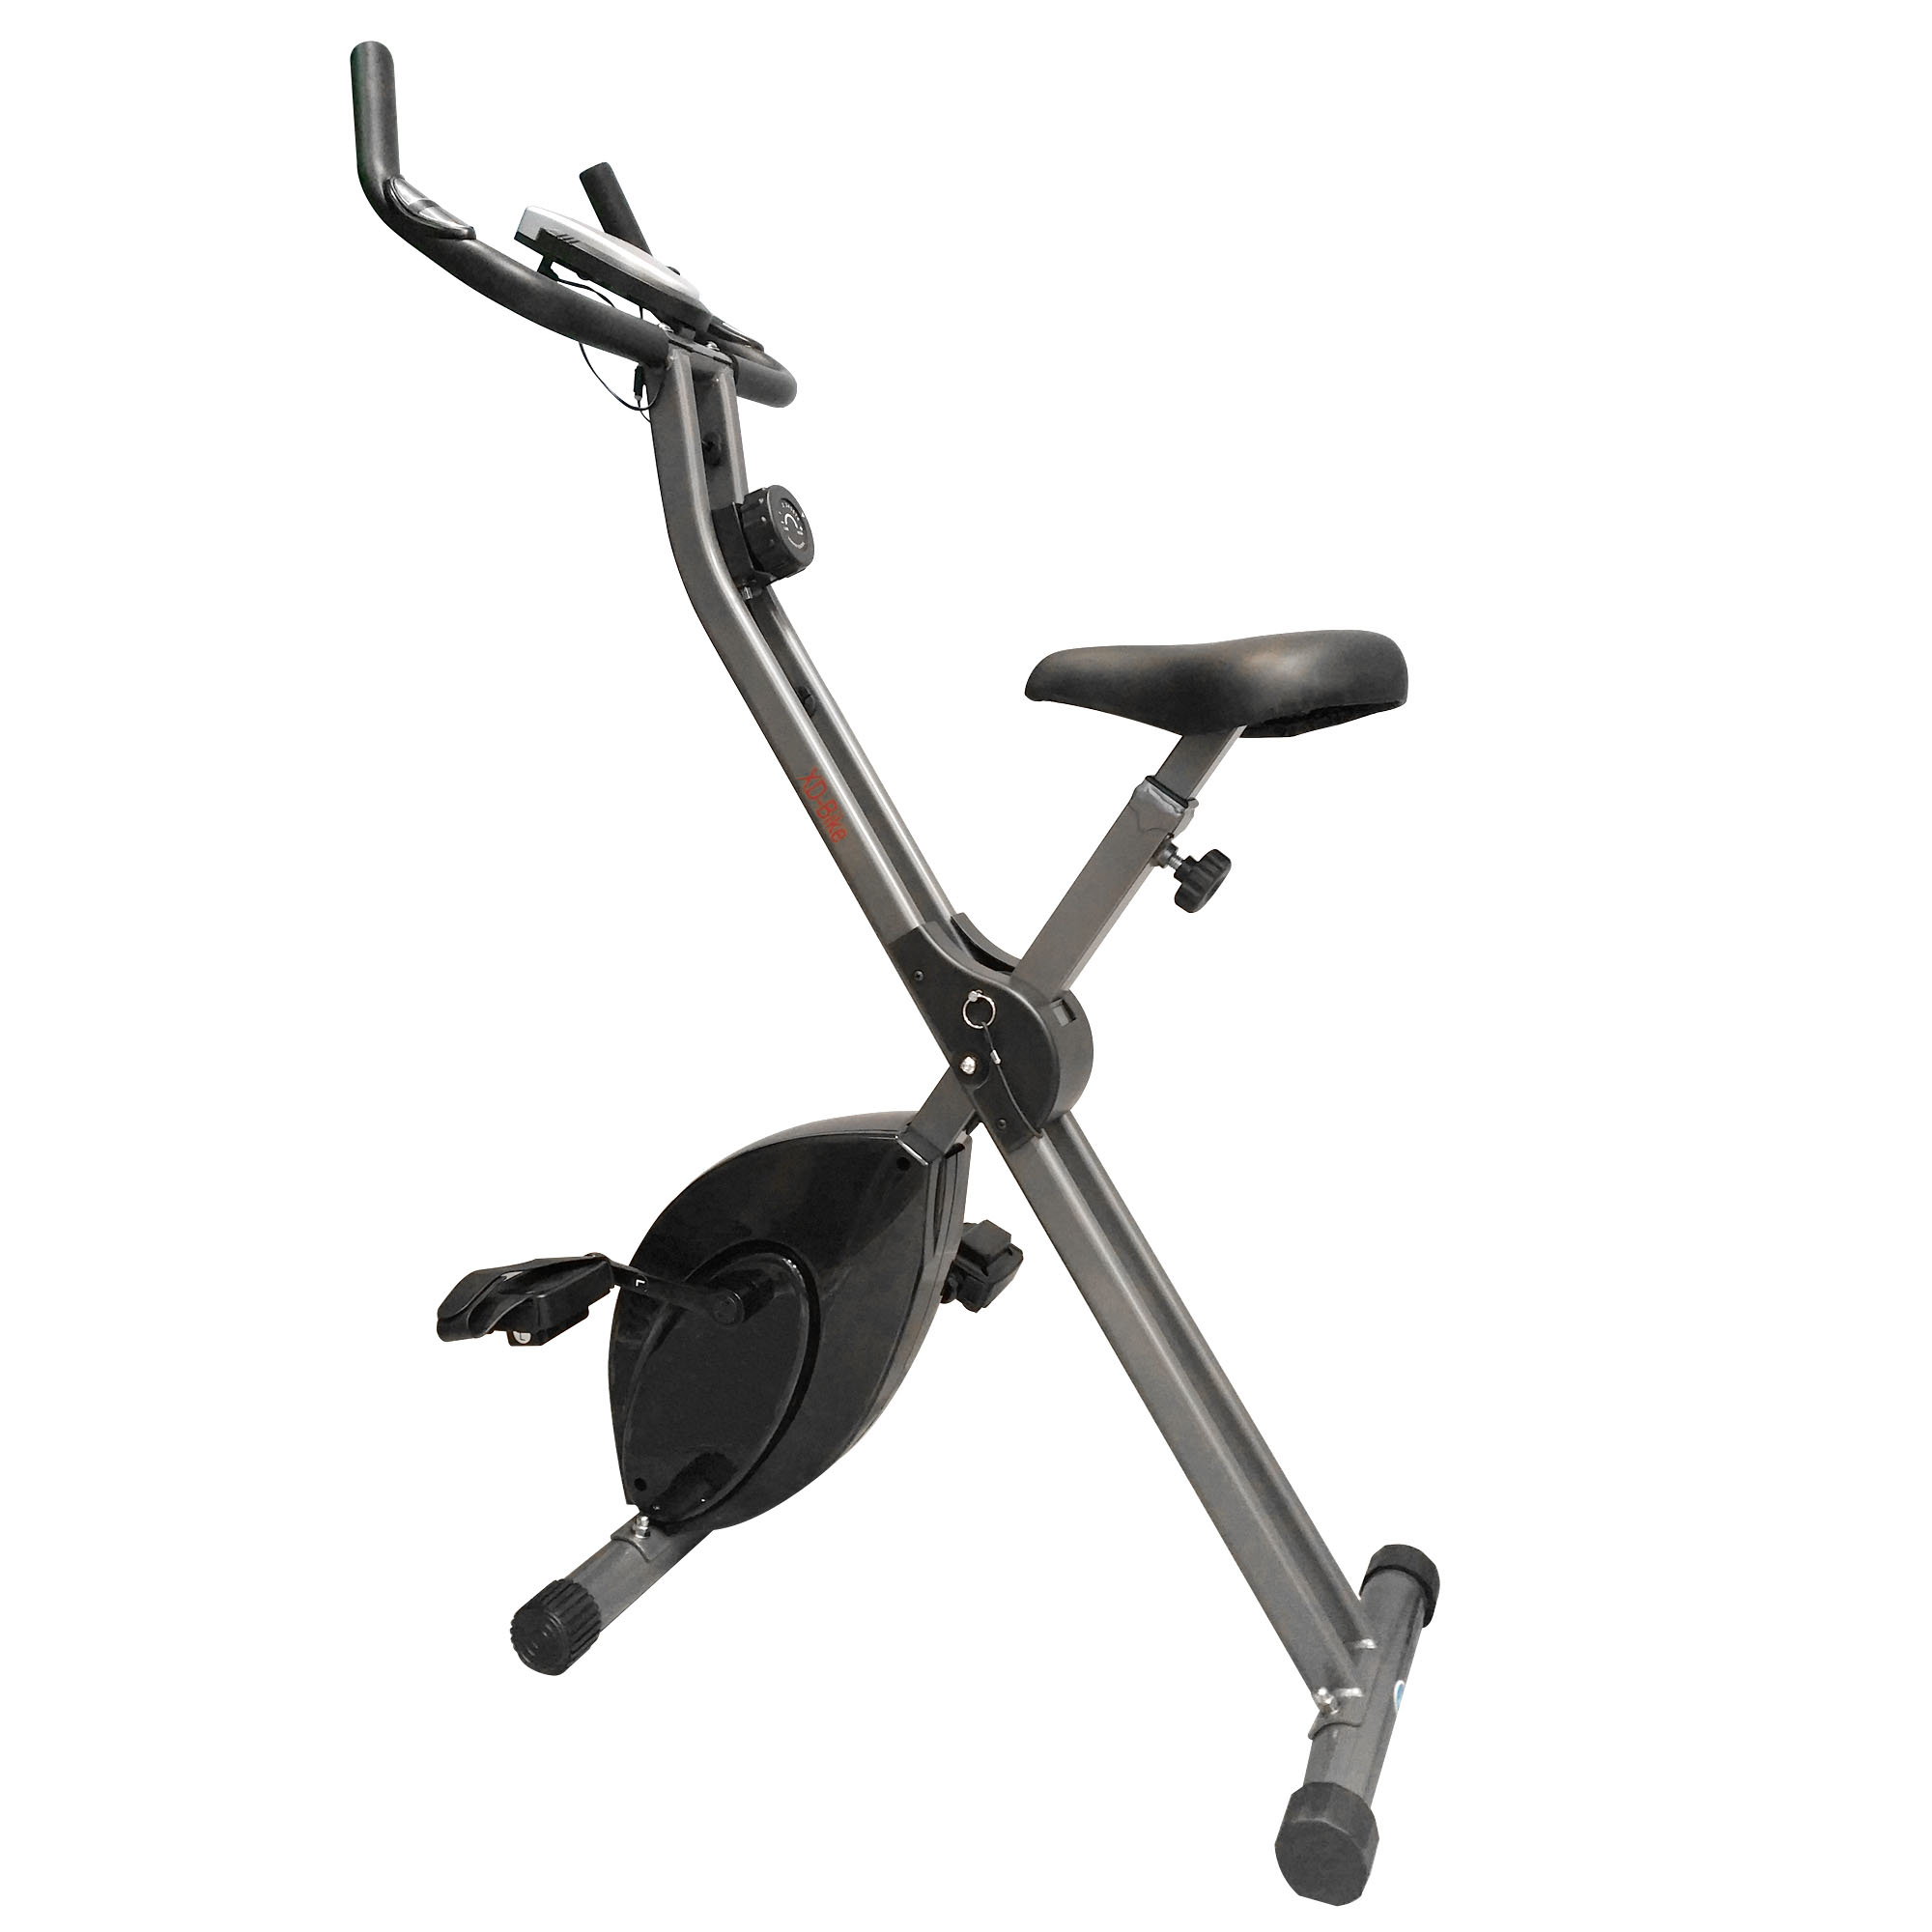 DKN Folding XD Exercise Bike - Black